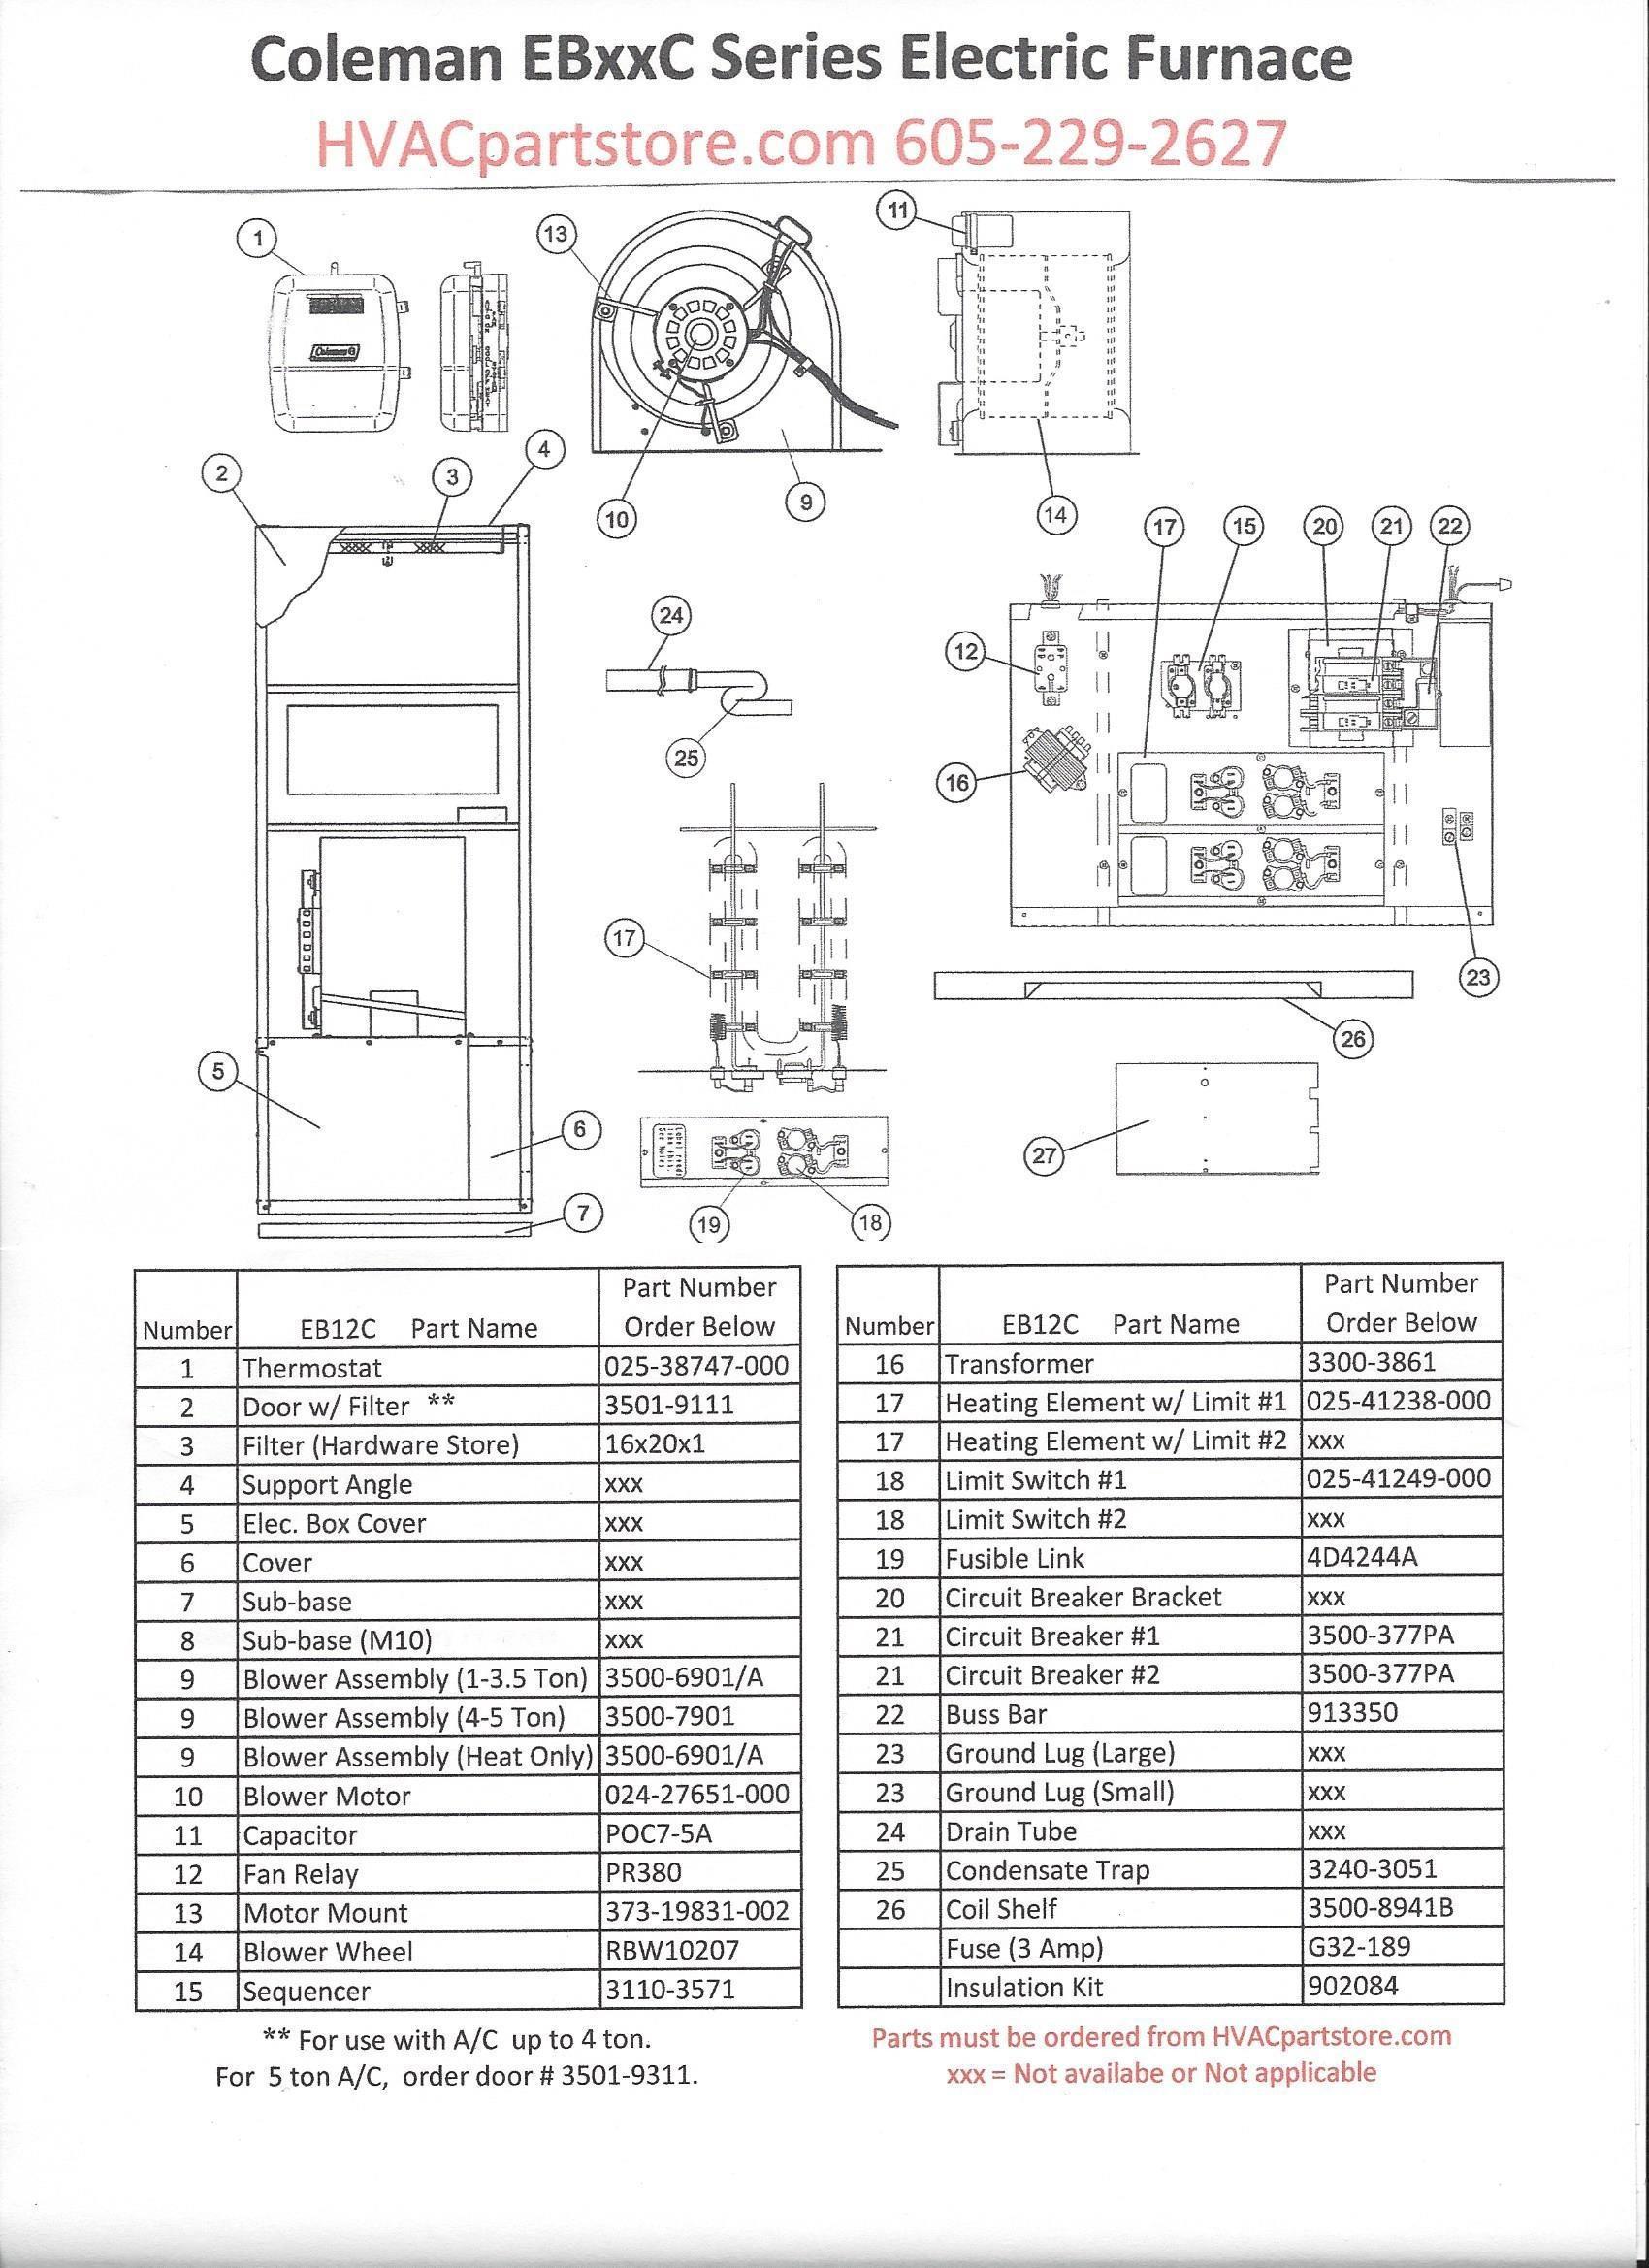 Tertherm Electric Furnace Wiring Diagram Elegant Eb12c Coleman Beautiful Intertherm Electric